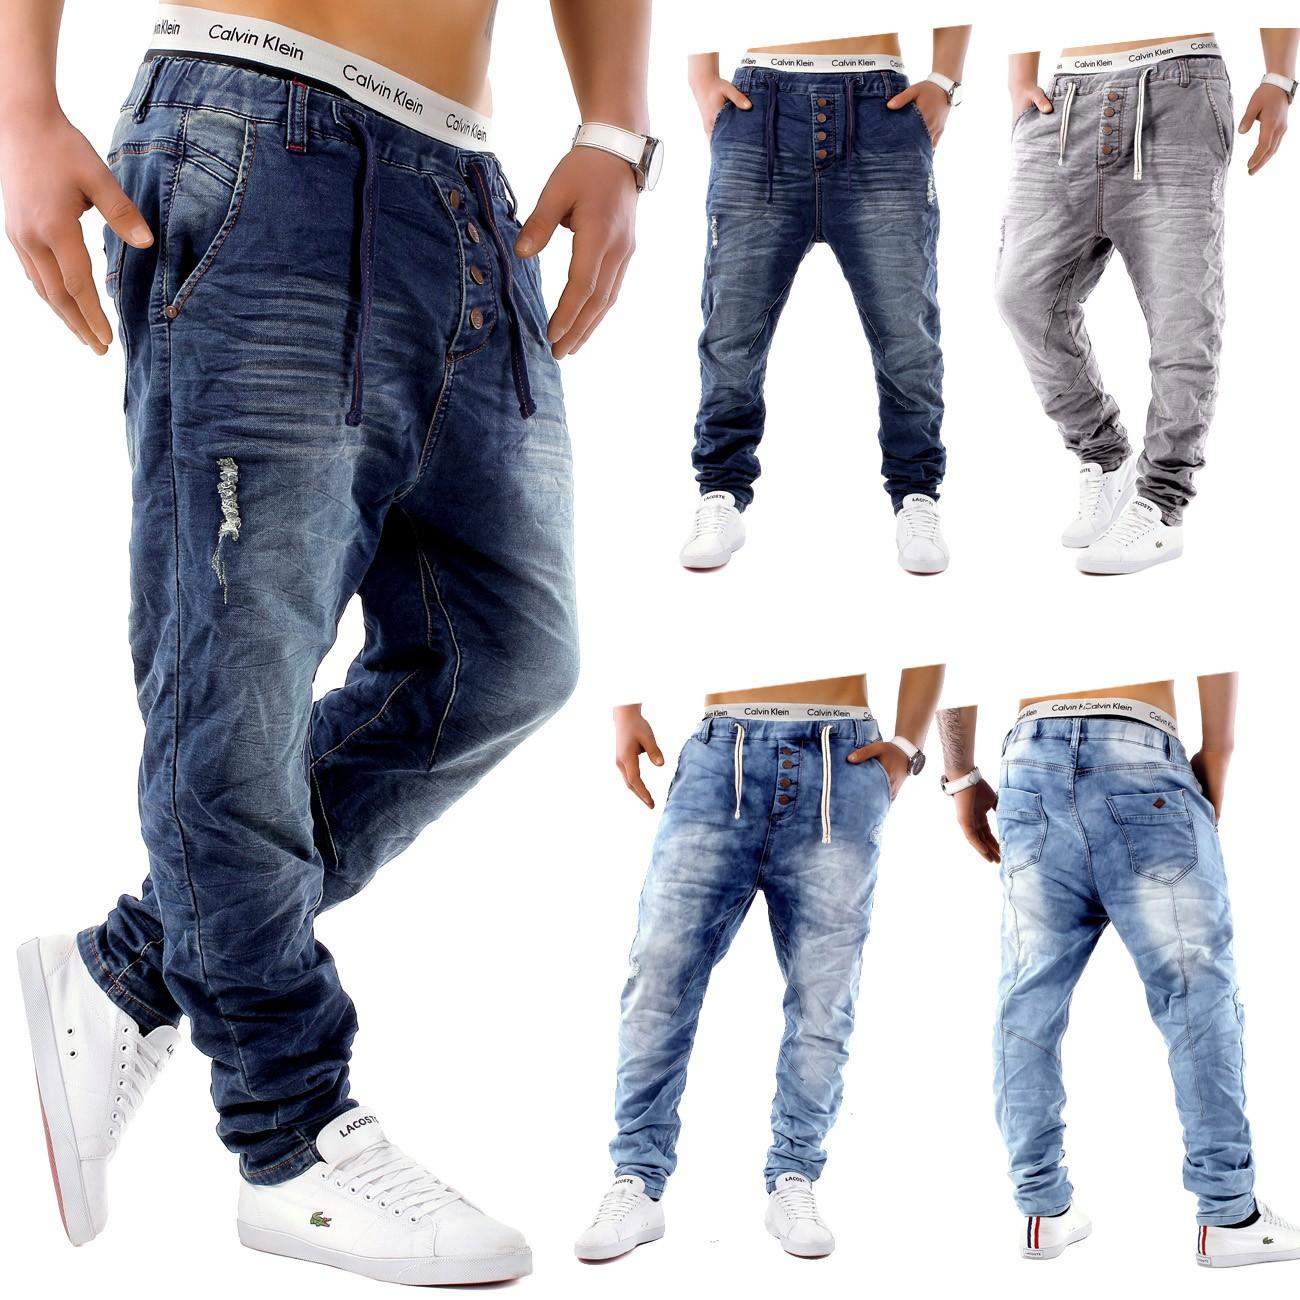 Jeans pour hommes Pantalons Jogg Denim Tube Jogging Jeans Backyard Freestar  - Nr 1242 4ff4afe91ebd